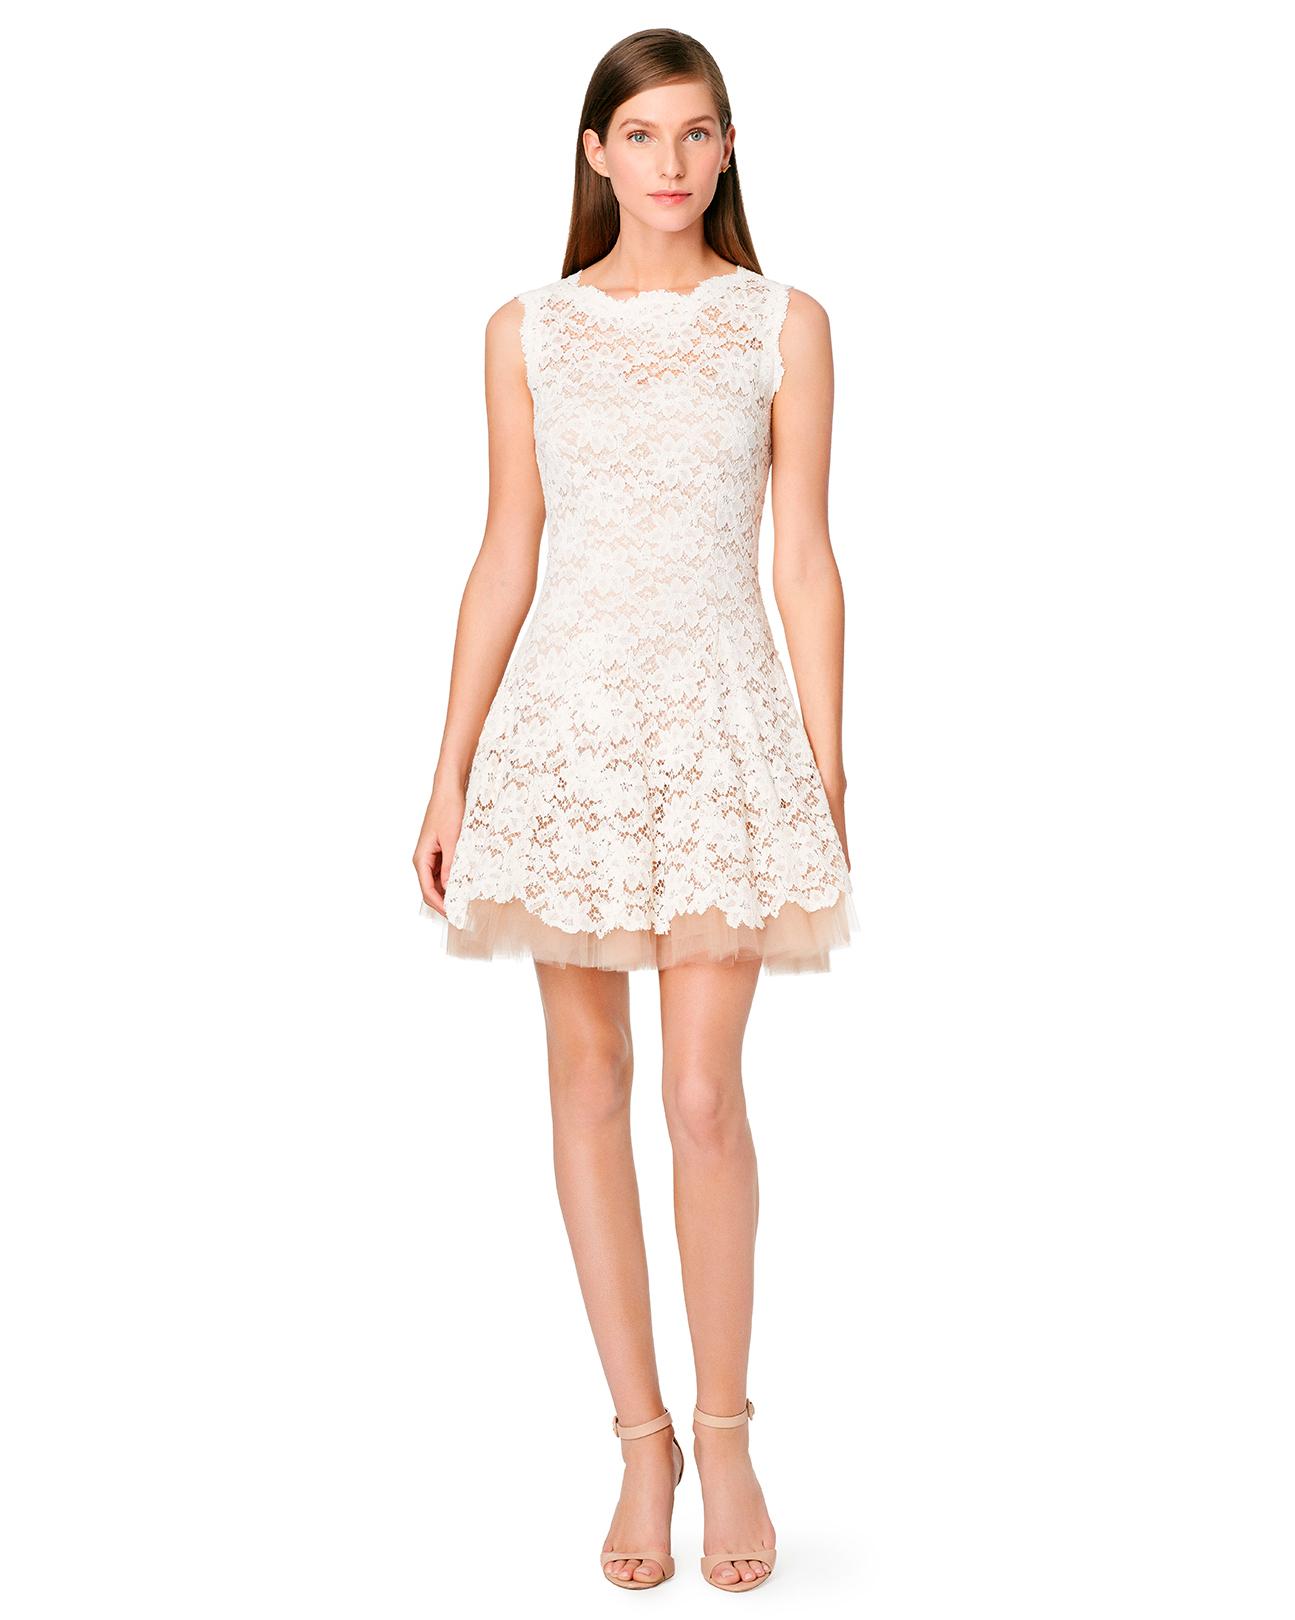 online-rental-wear-companies-rent-the-runway-dress-nha-khanh-0415.jpg